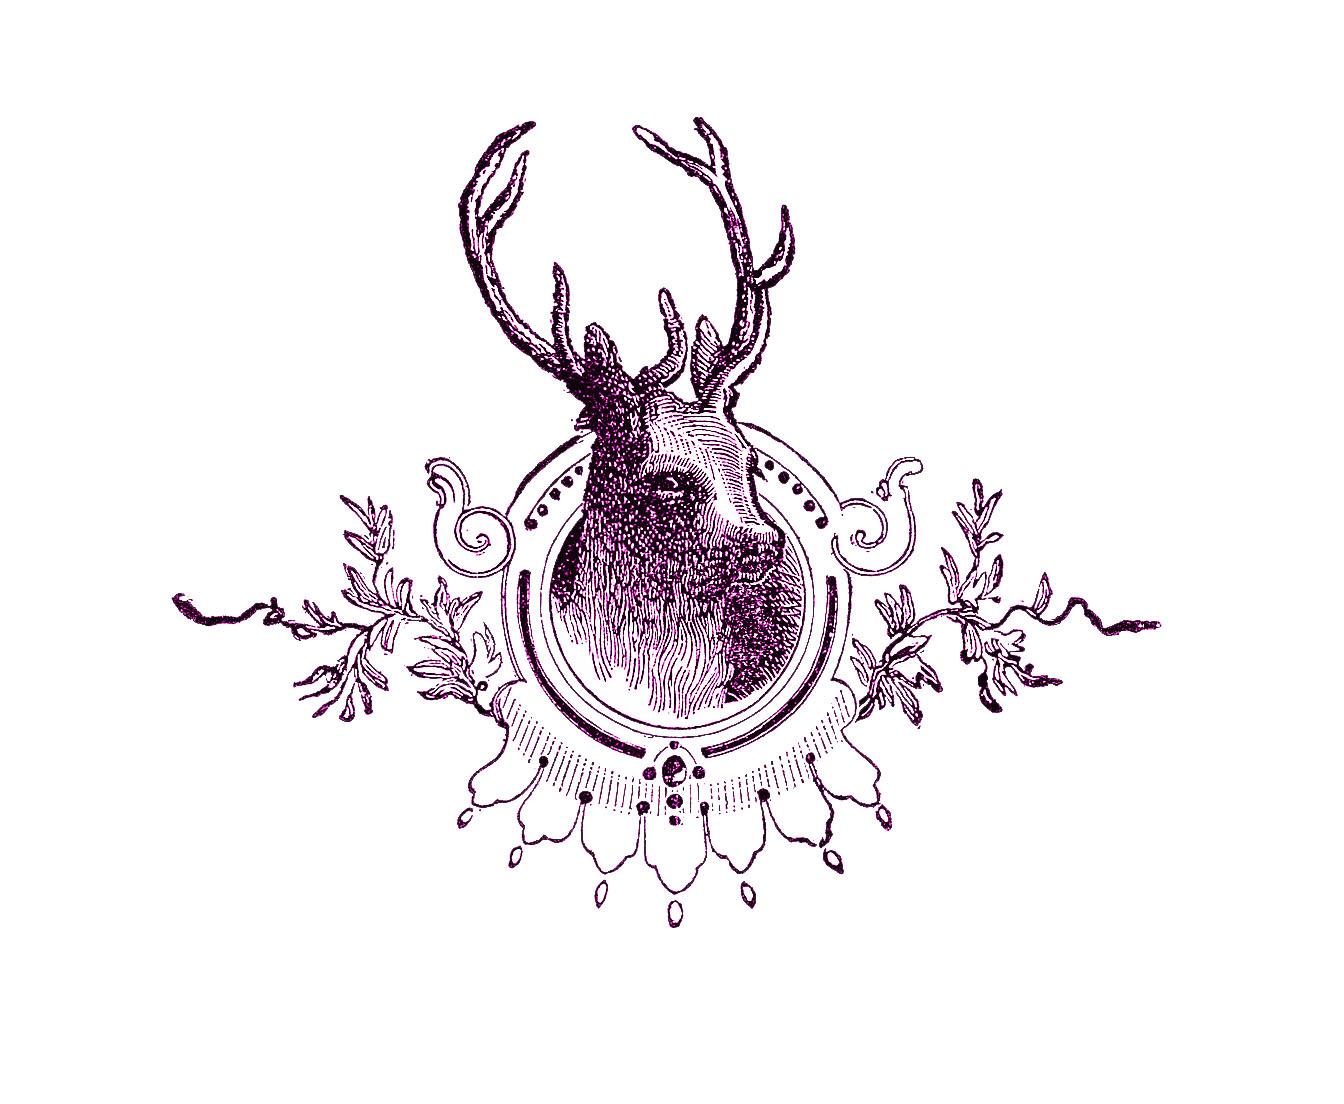 vintage christmas image deer head engraving the graphics fairy. Black Bedroom Furniture Sets. Home Design Ideas